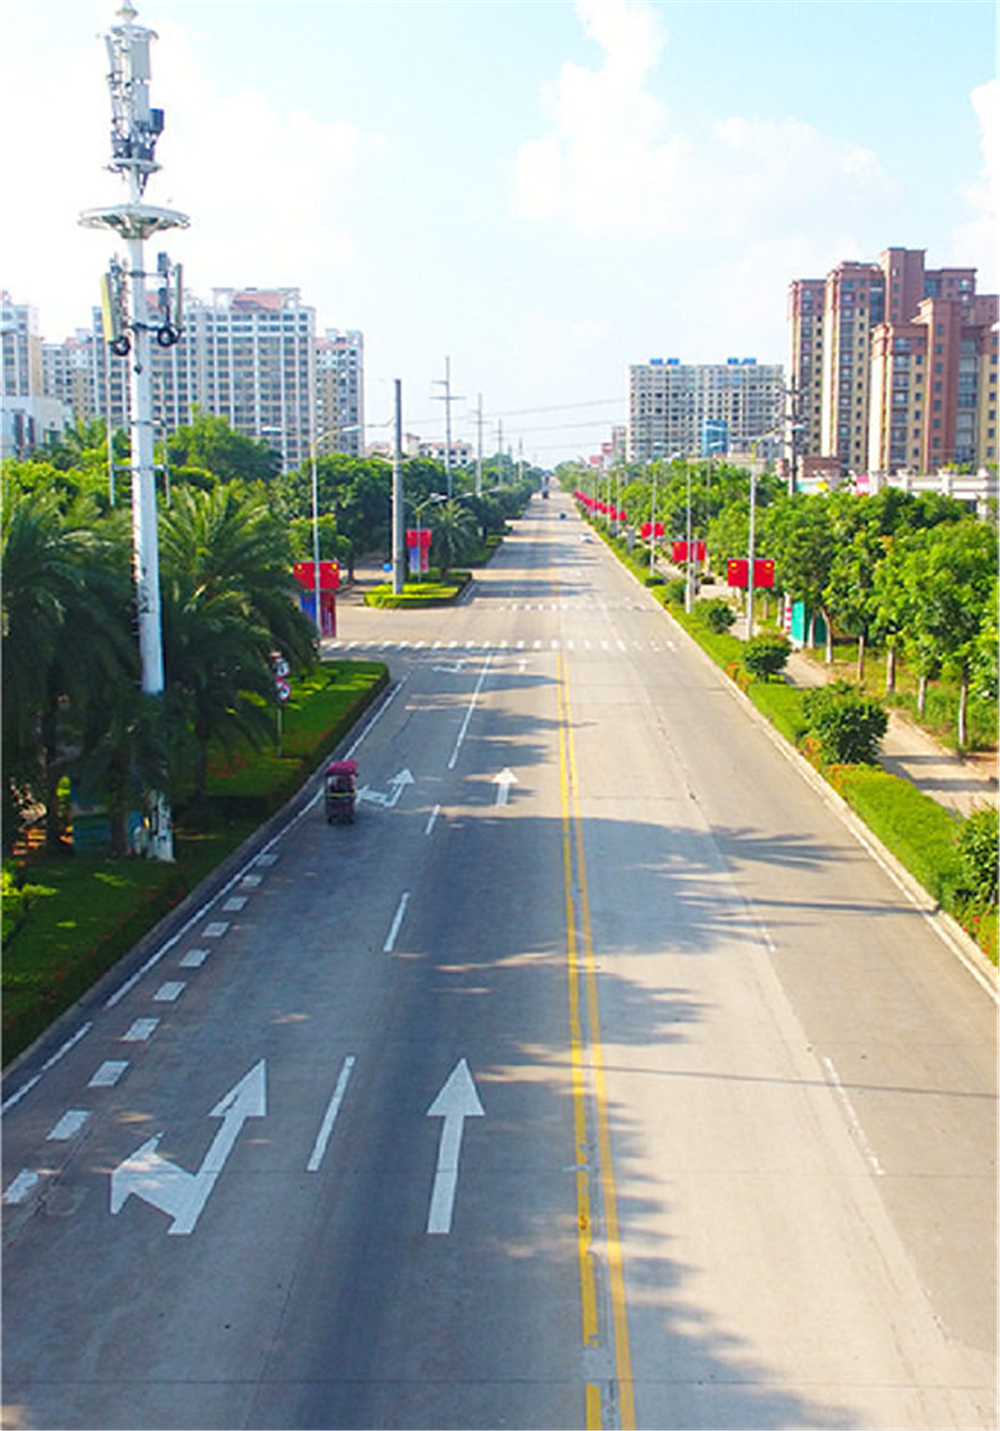 http://yuefangwangimg.oss-cn-hangzhou.aliyuncs.com/uploads/20200915/c5704ee7d22e9b17a011bb6b62584c83Max.jpg